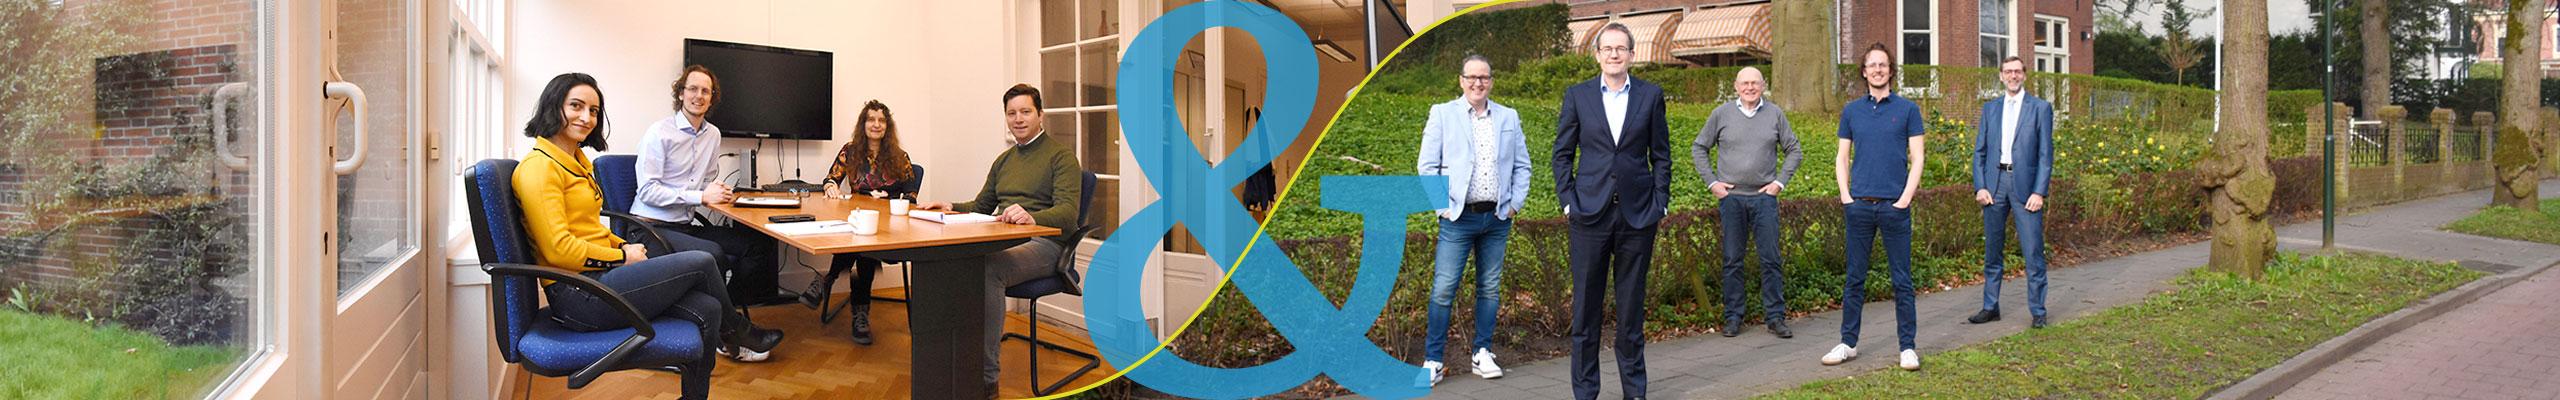 M&K Accountants en belastingadviseurs Hilversum